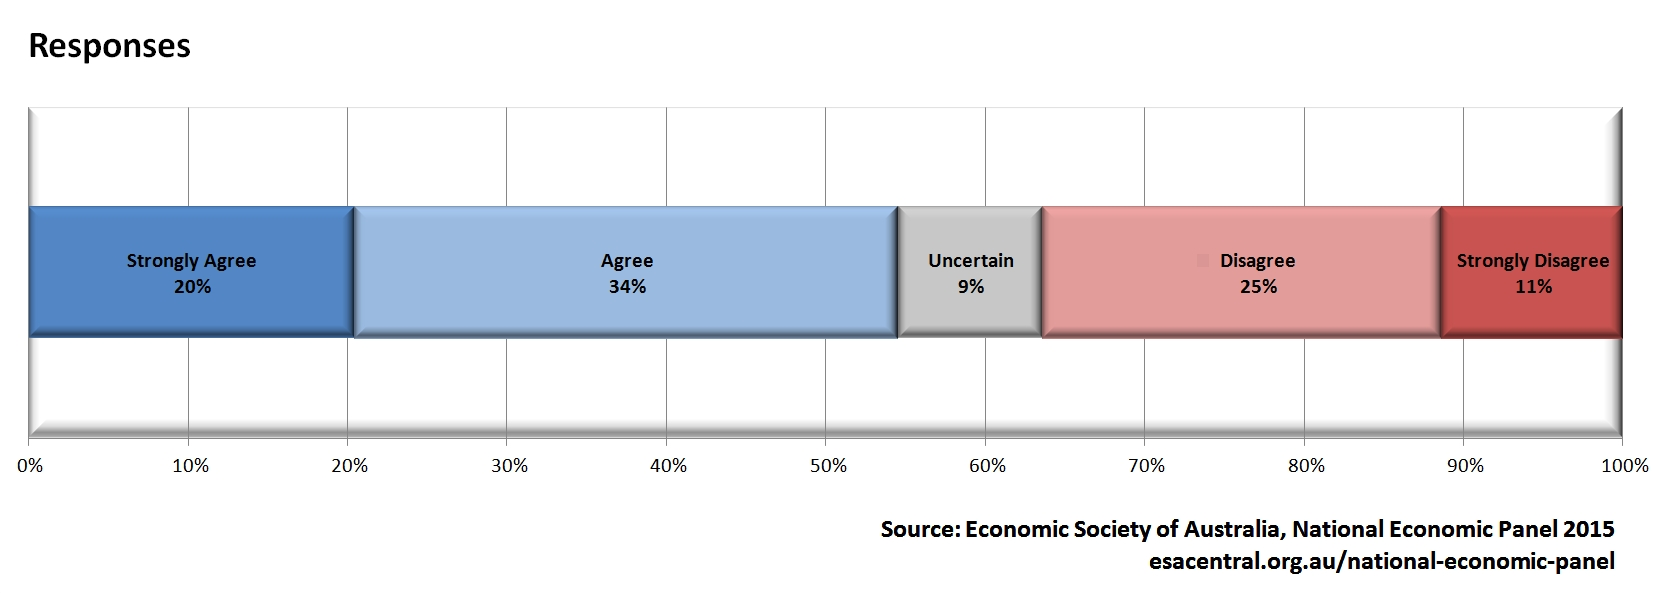 NEP Q1 - Chart 1.1 (Responses)